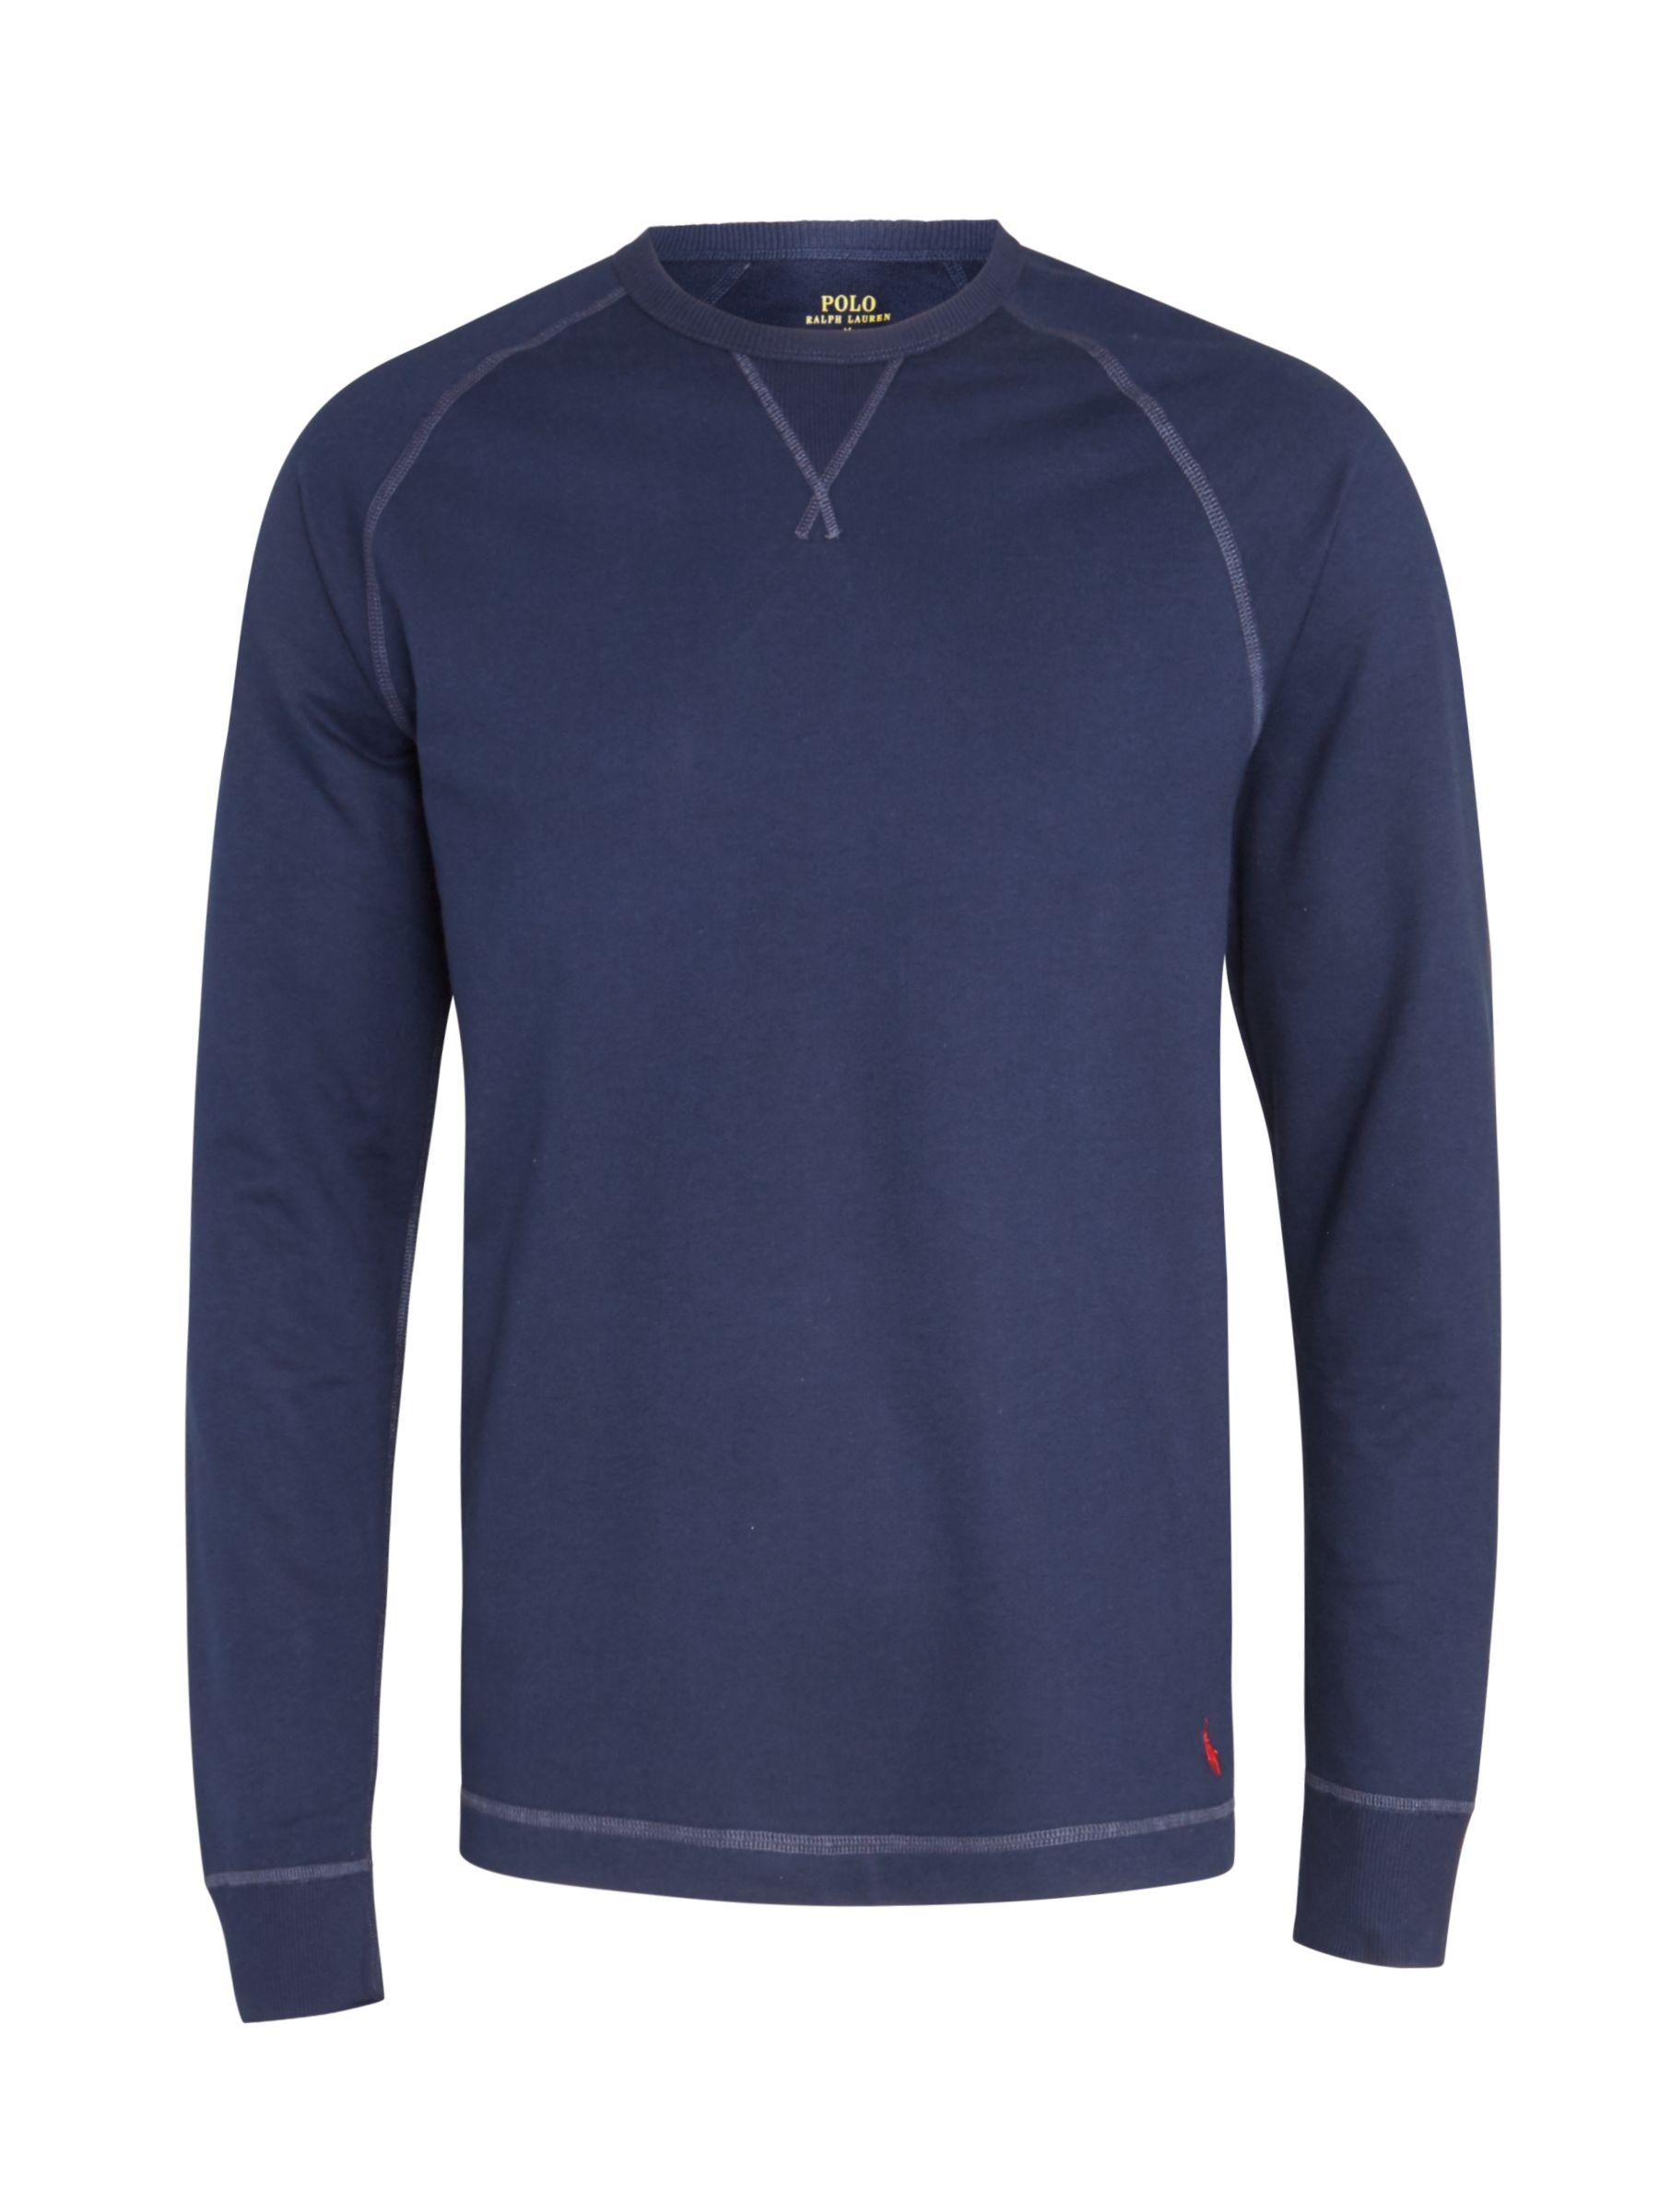 2e6a7be3 Polo Ralph Lauren Cotton Terry Crew Neck Sweatshirt, Navy at ...